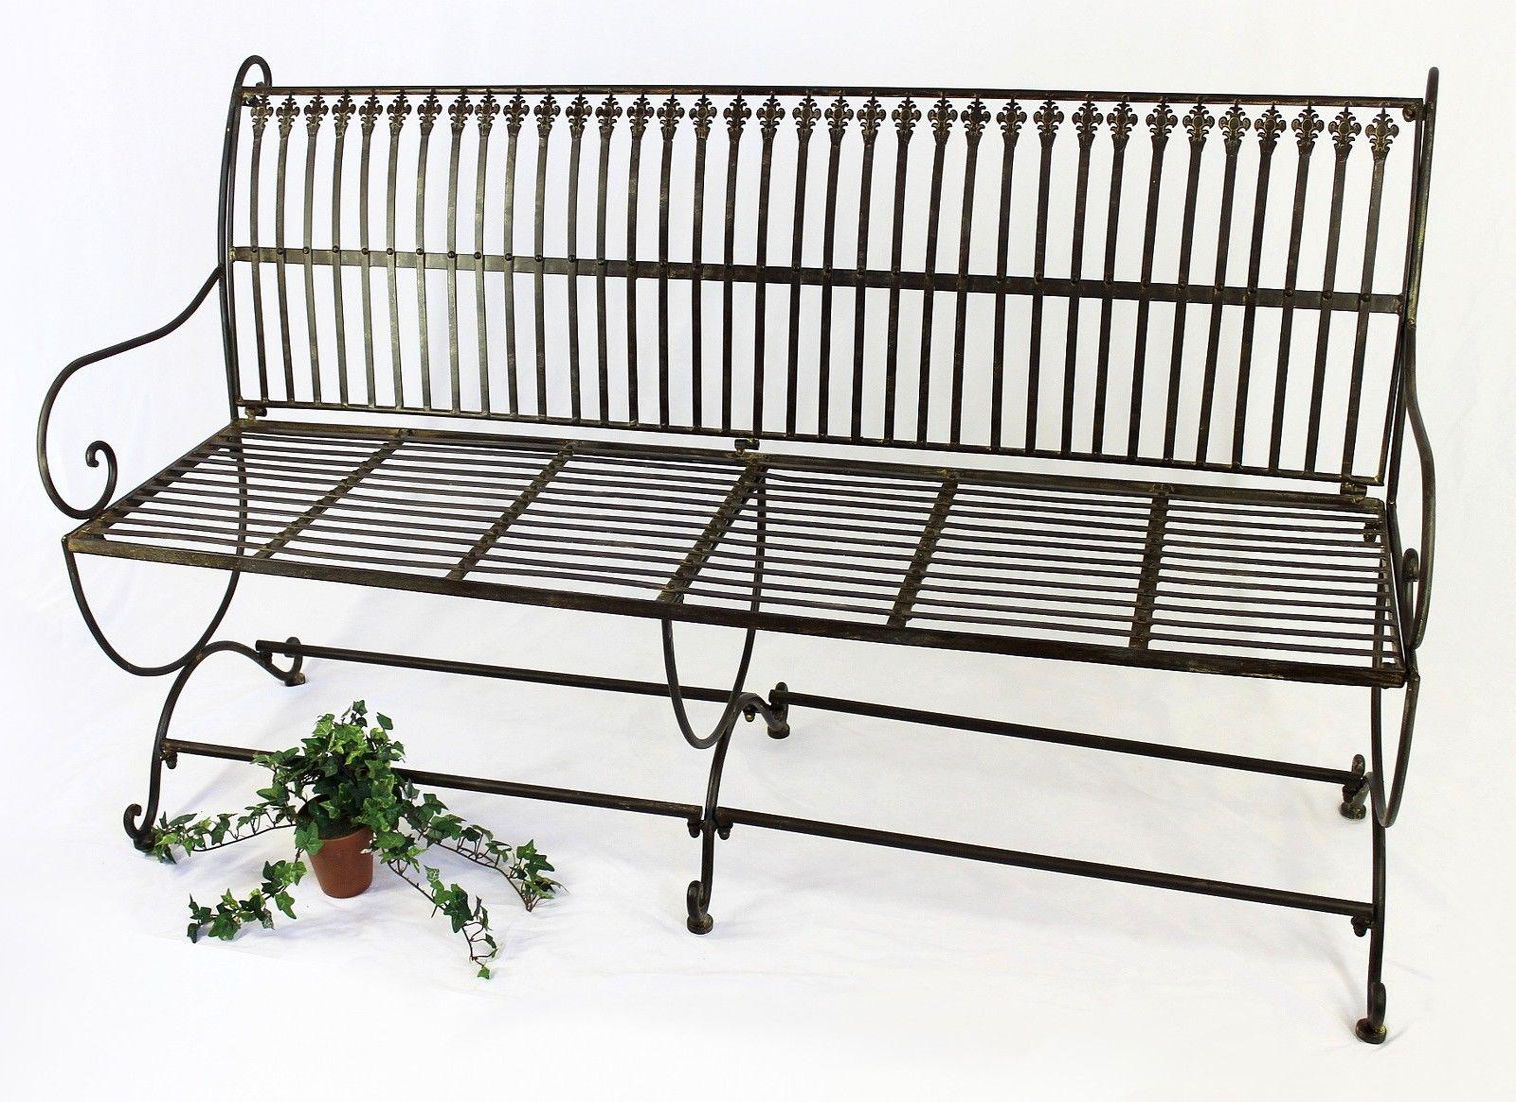 bank finca 063 jo 3 sitzer aus metall gartenbank sitzbank baumbank 153 cm braun 4019230600634 ebay. Black Bedroom Furniture Sets. Home Design Ideas